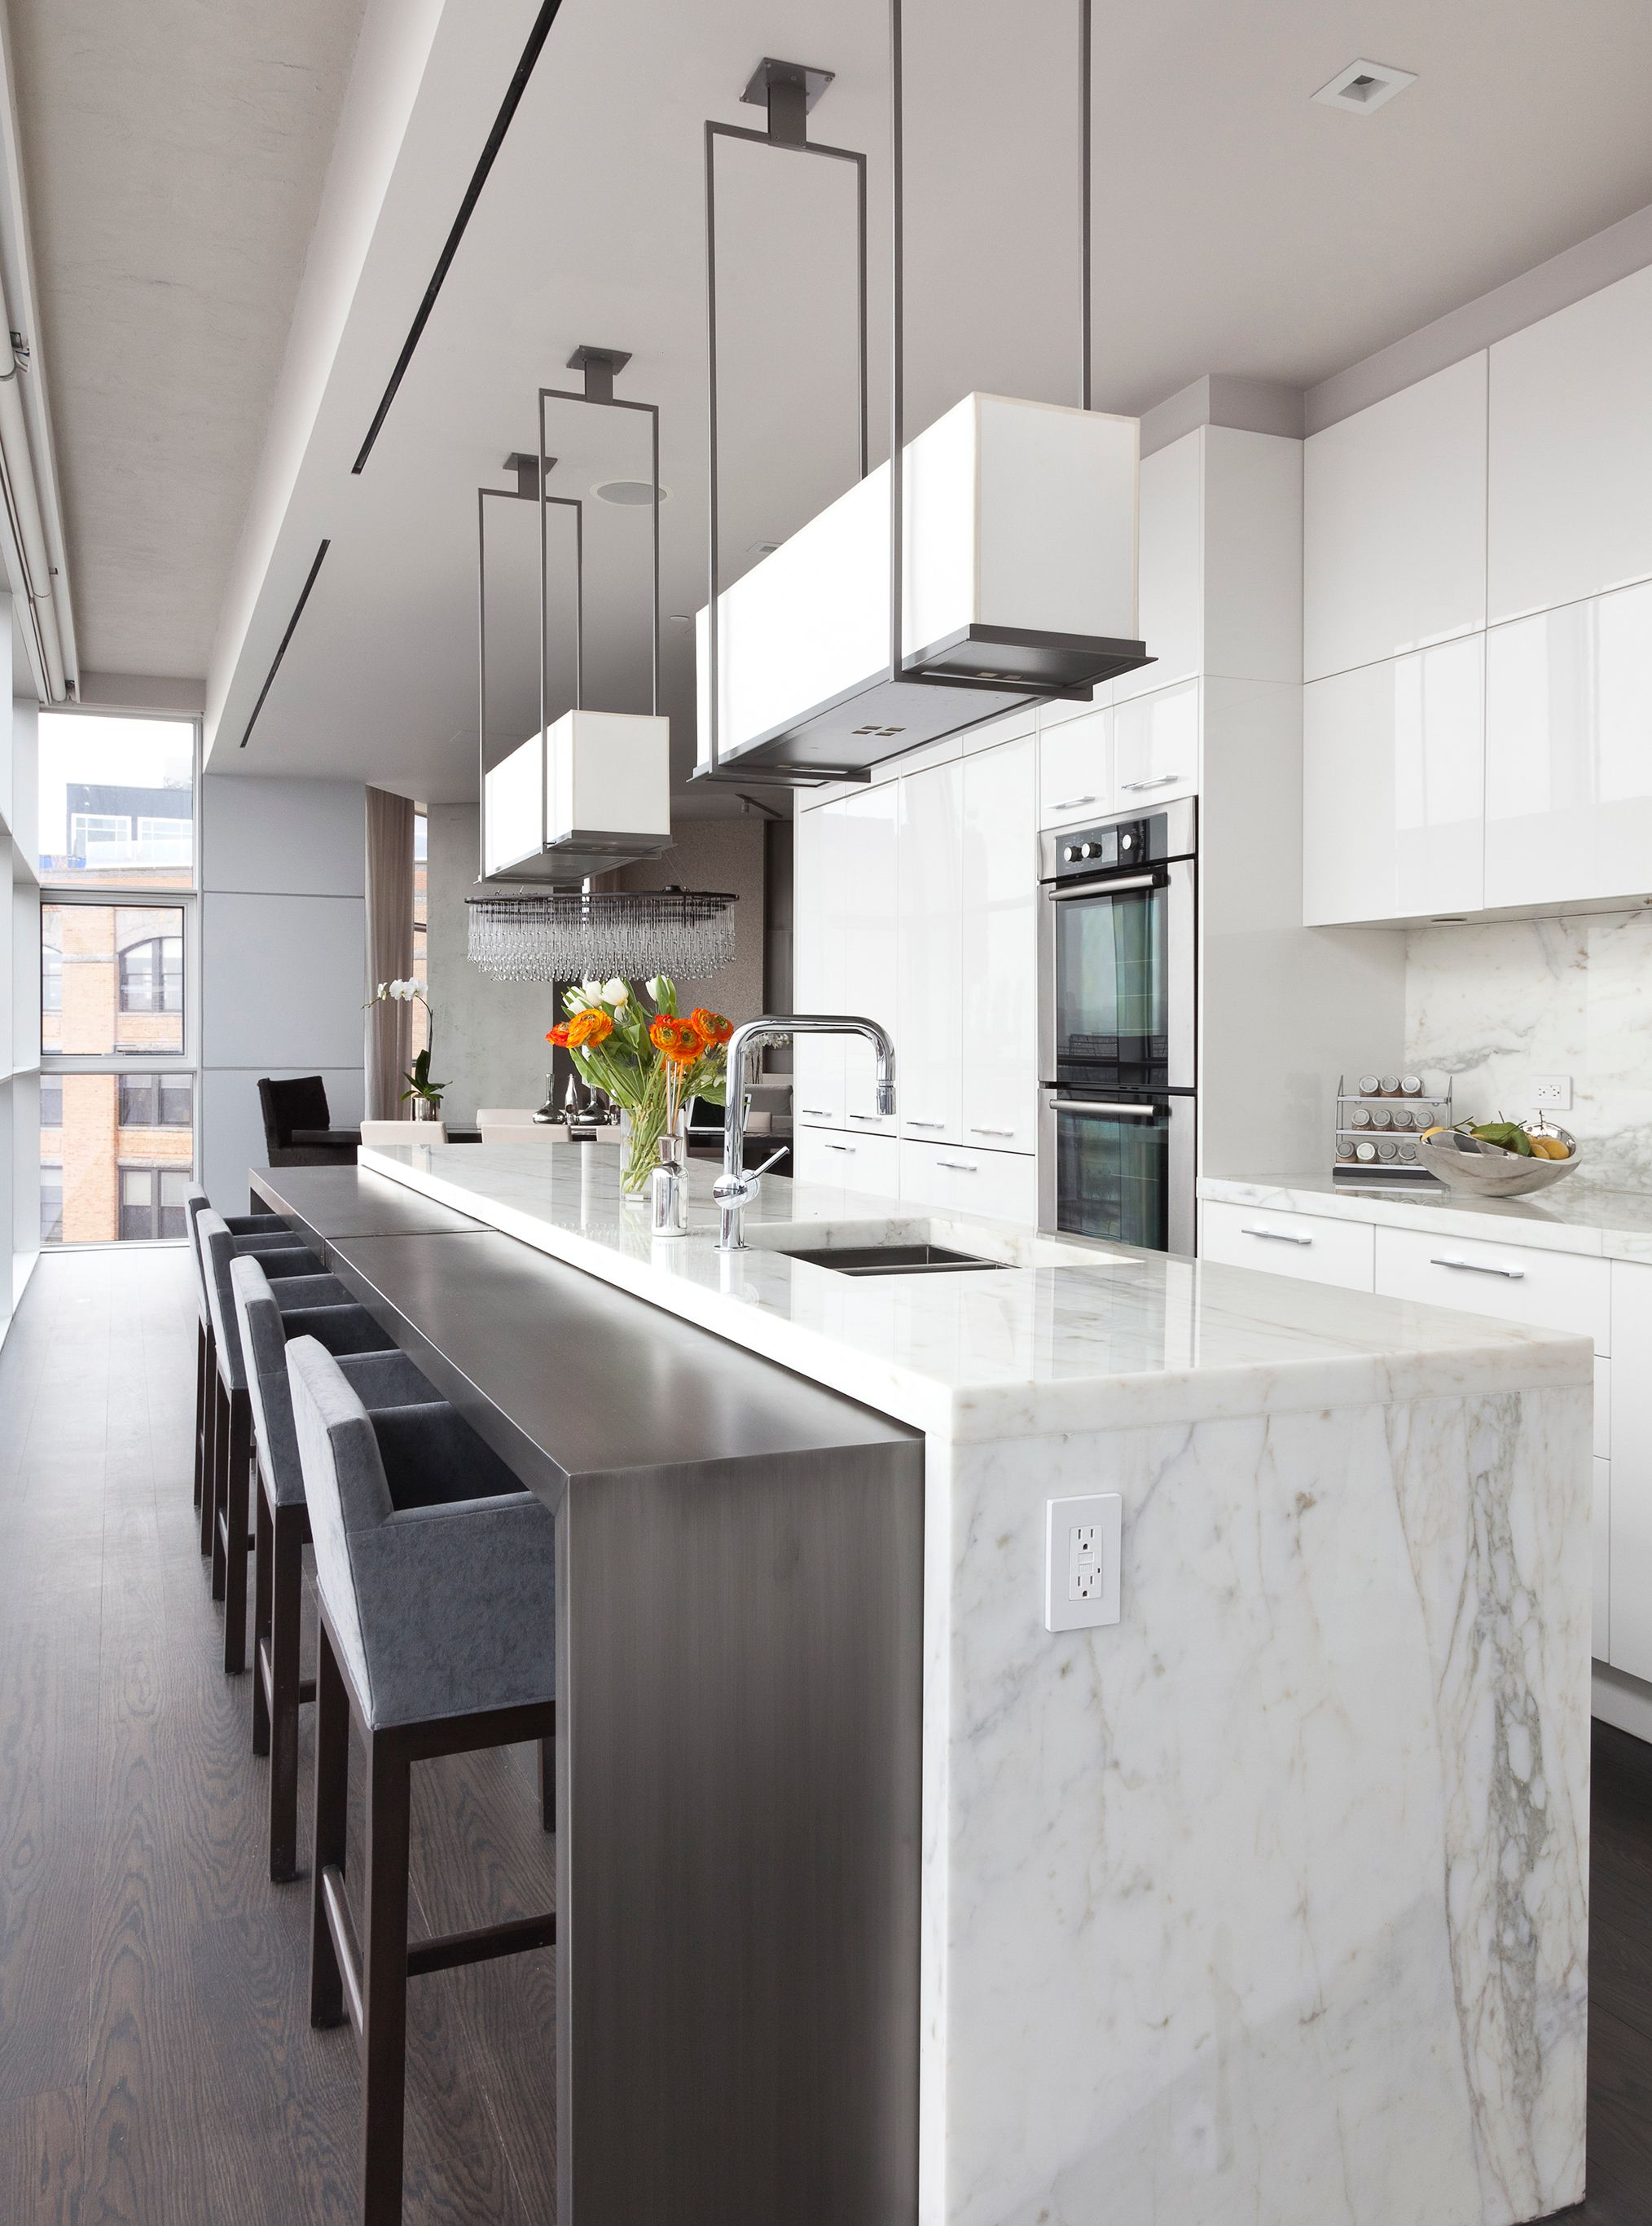 tribeca penthouse luxury kitchen design best kitchen designs kitchen design on kitchen interior luxury id=97747